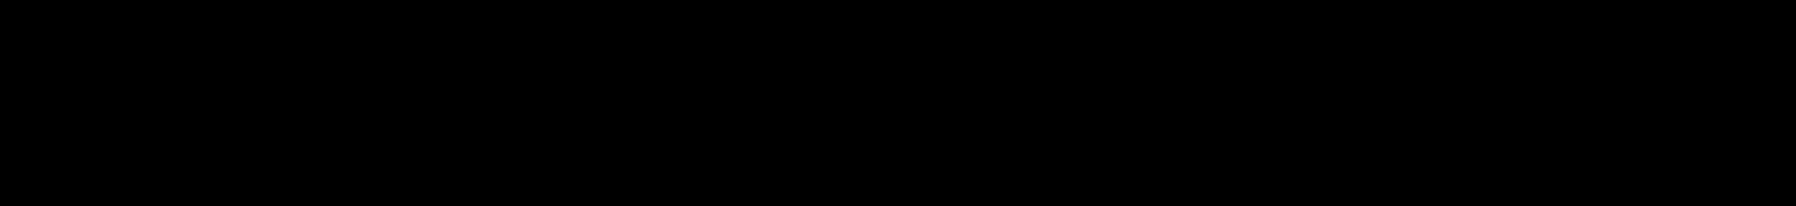 Doperobes